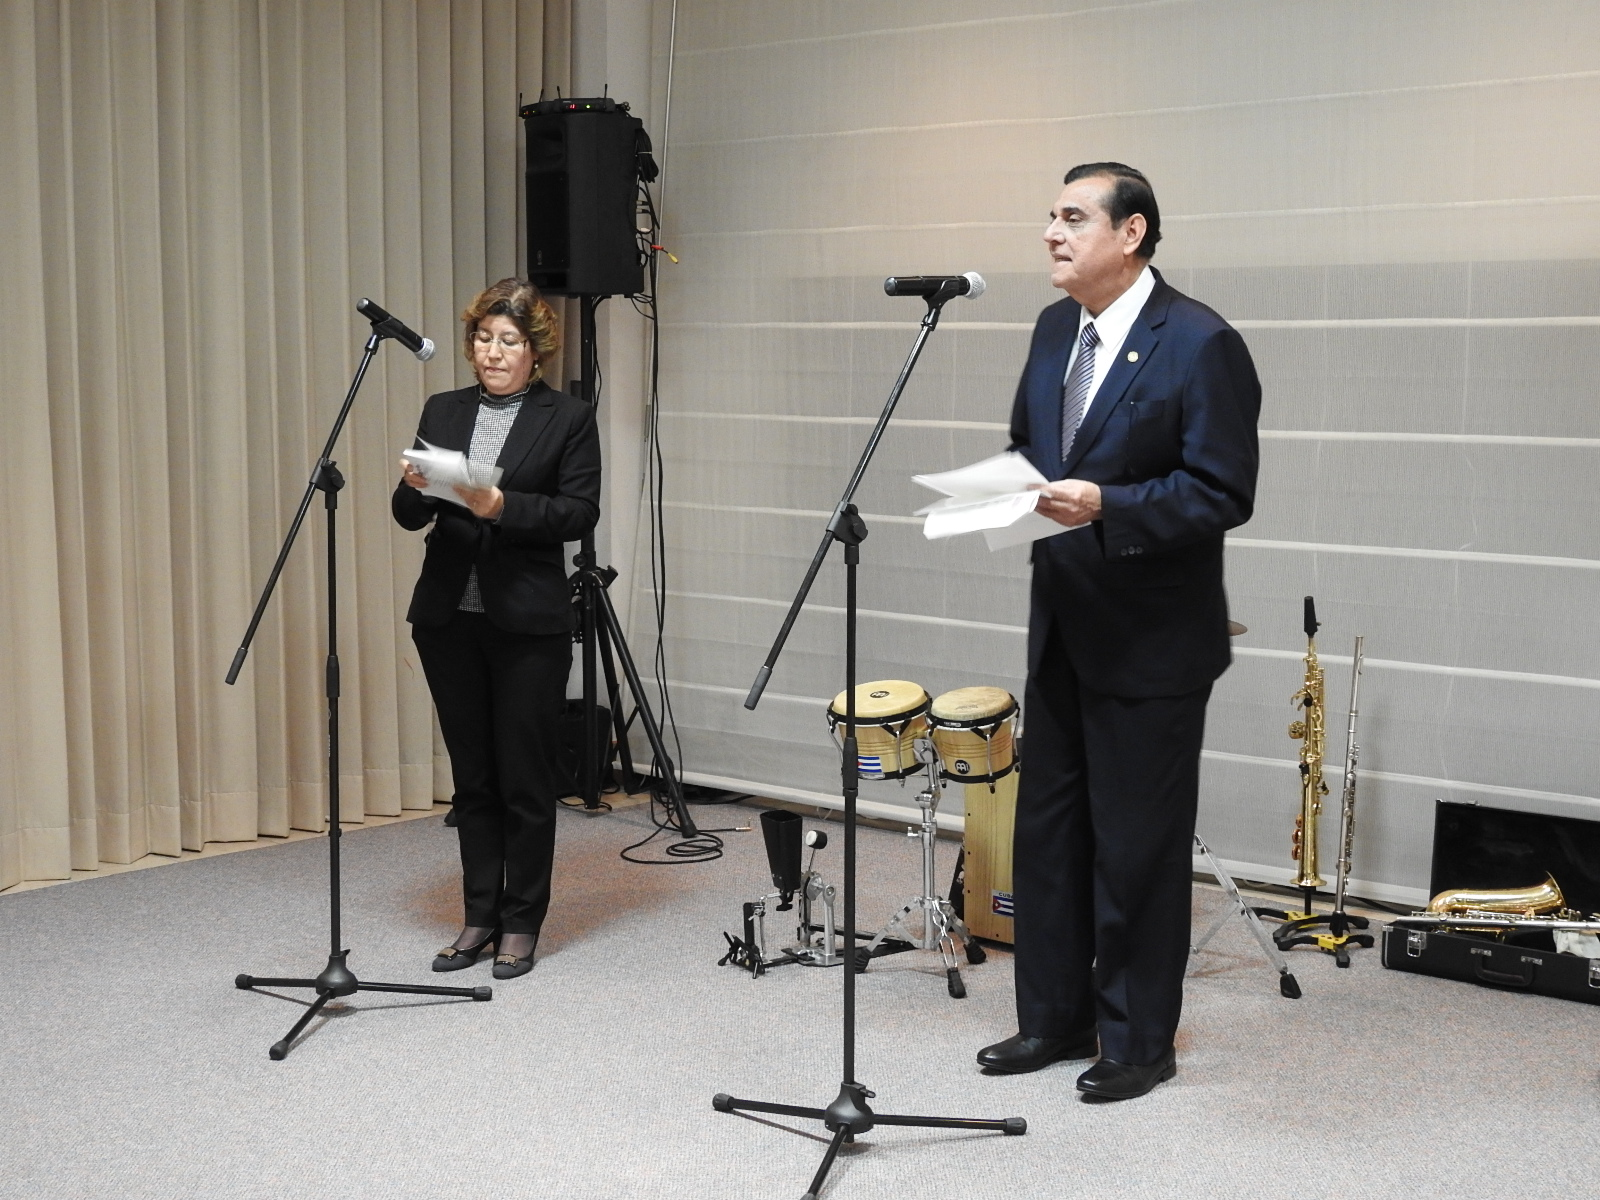 H.E. Saul Arana, Ambassador of Nicaragua, giving the welcome greetings